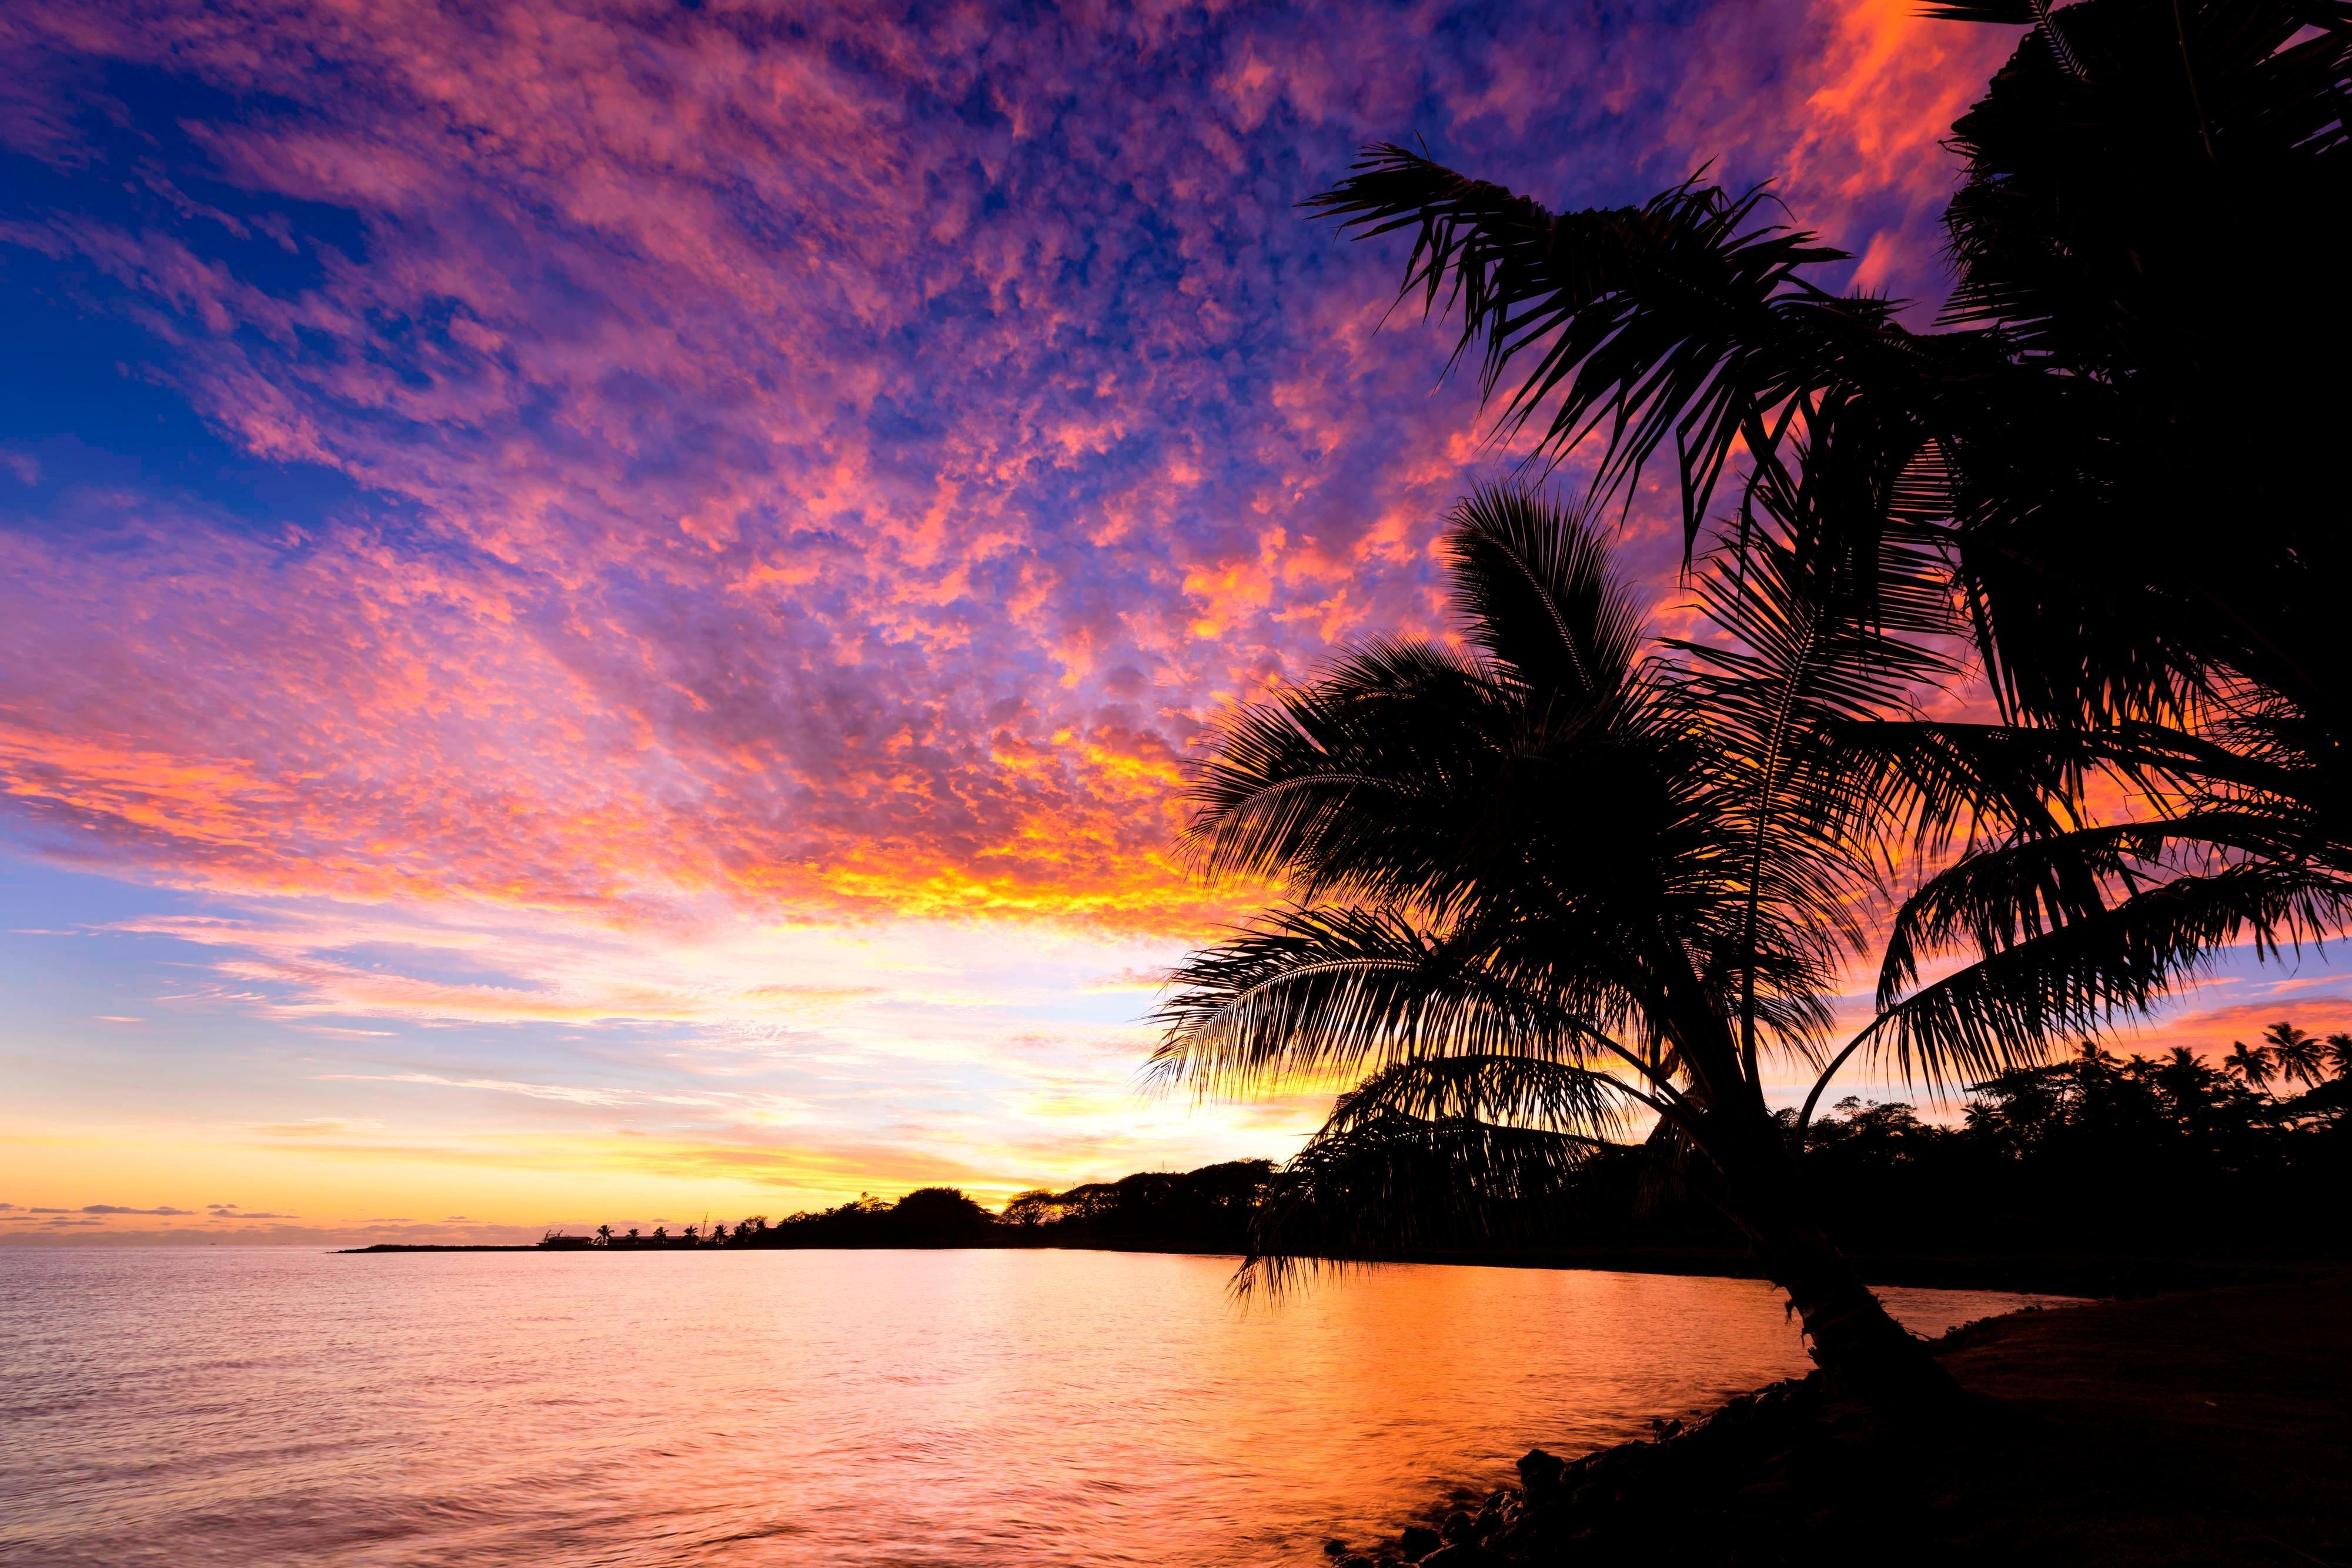 Sheraton Samoa Beach Resort Sunset